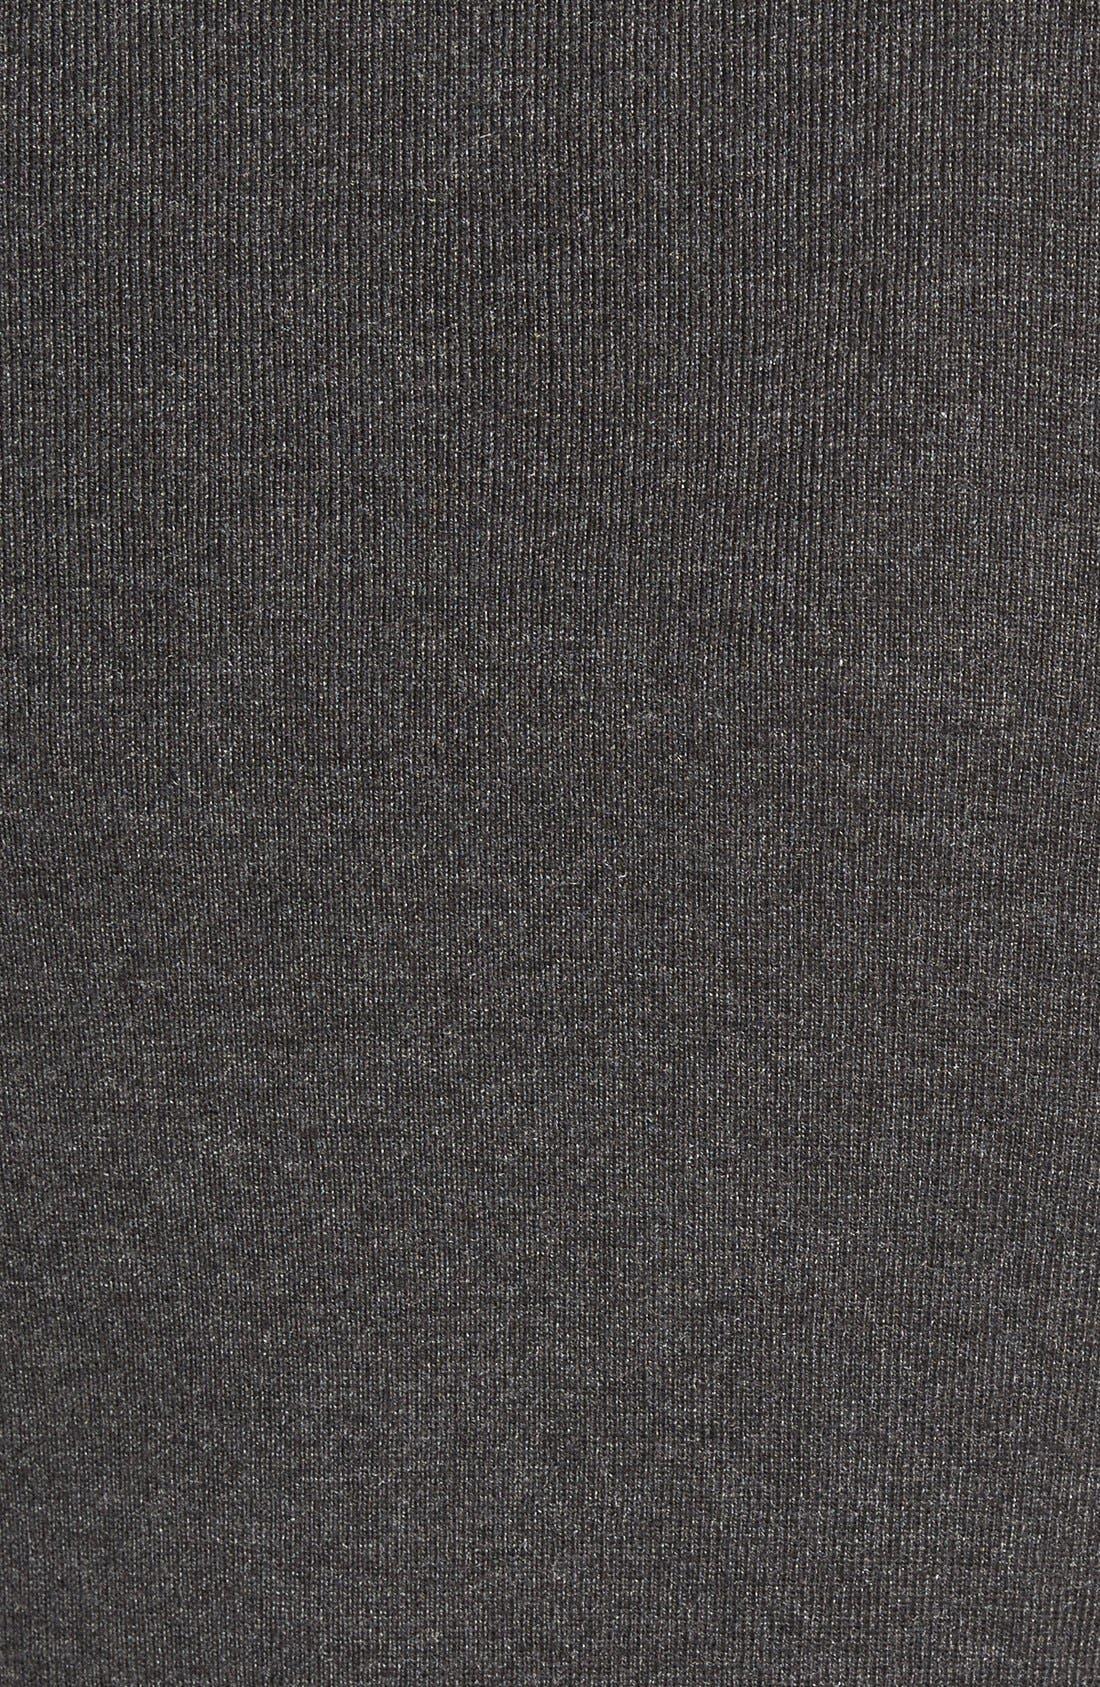 4-Way Convertible Lightweight Cardigan,                             Alternate thumbnail 97, color,